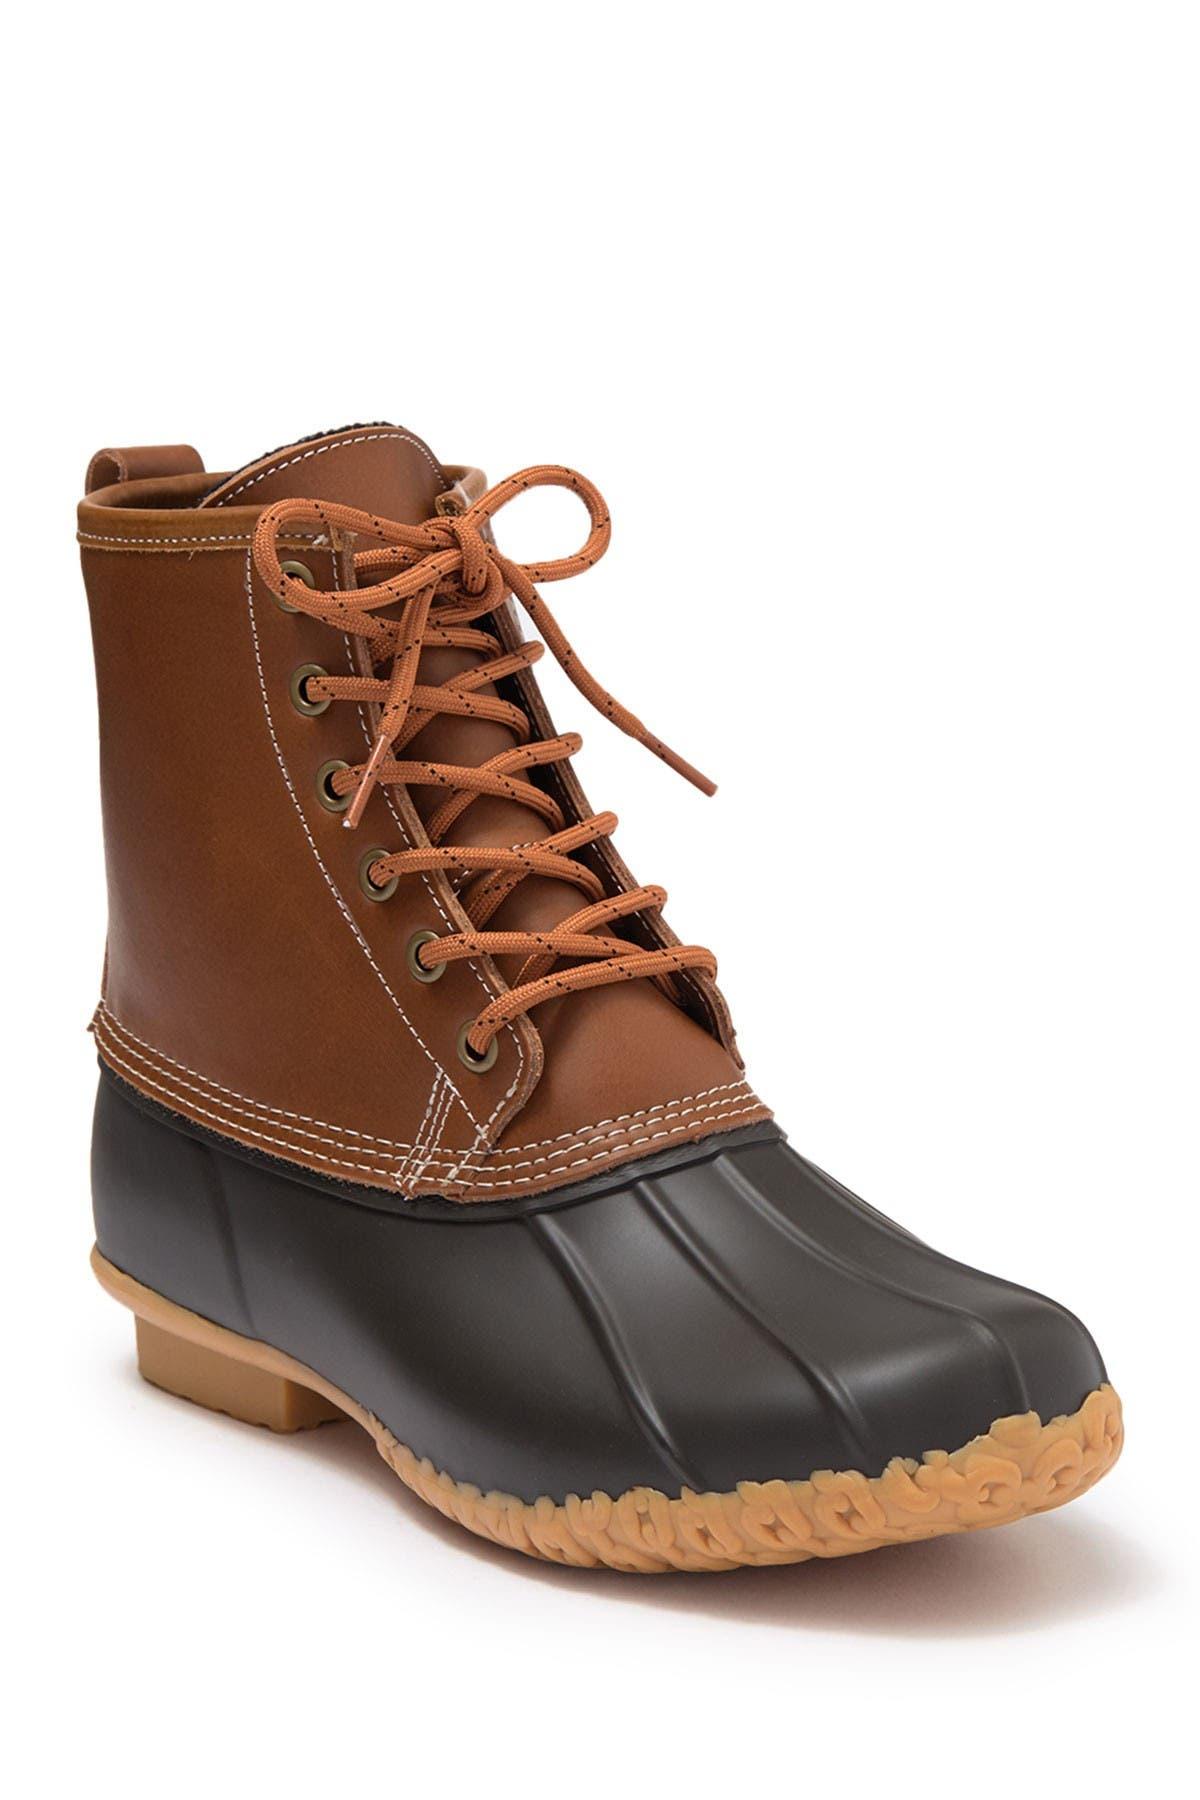 Sebago | Waterproof Duck Boot - Wide